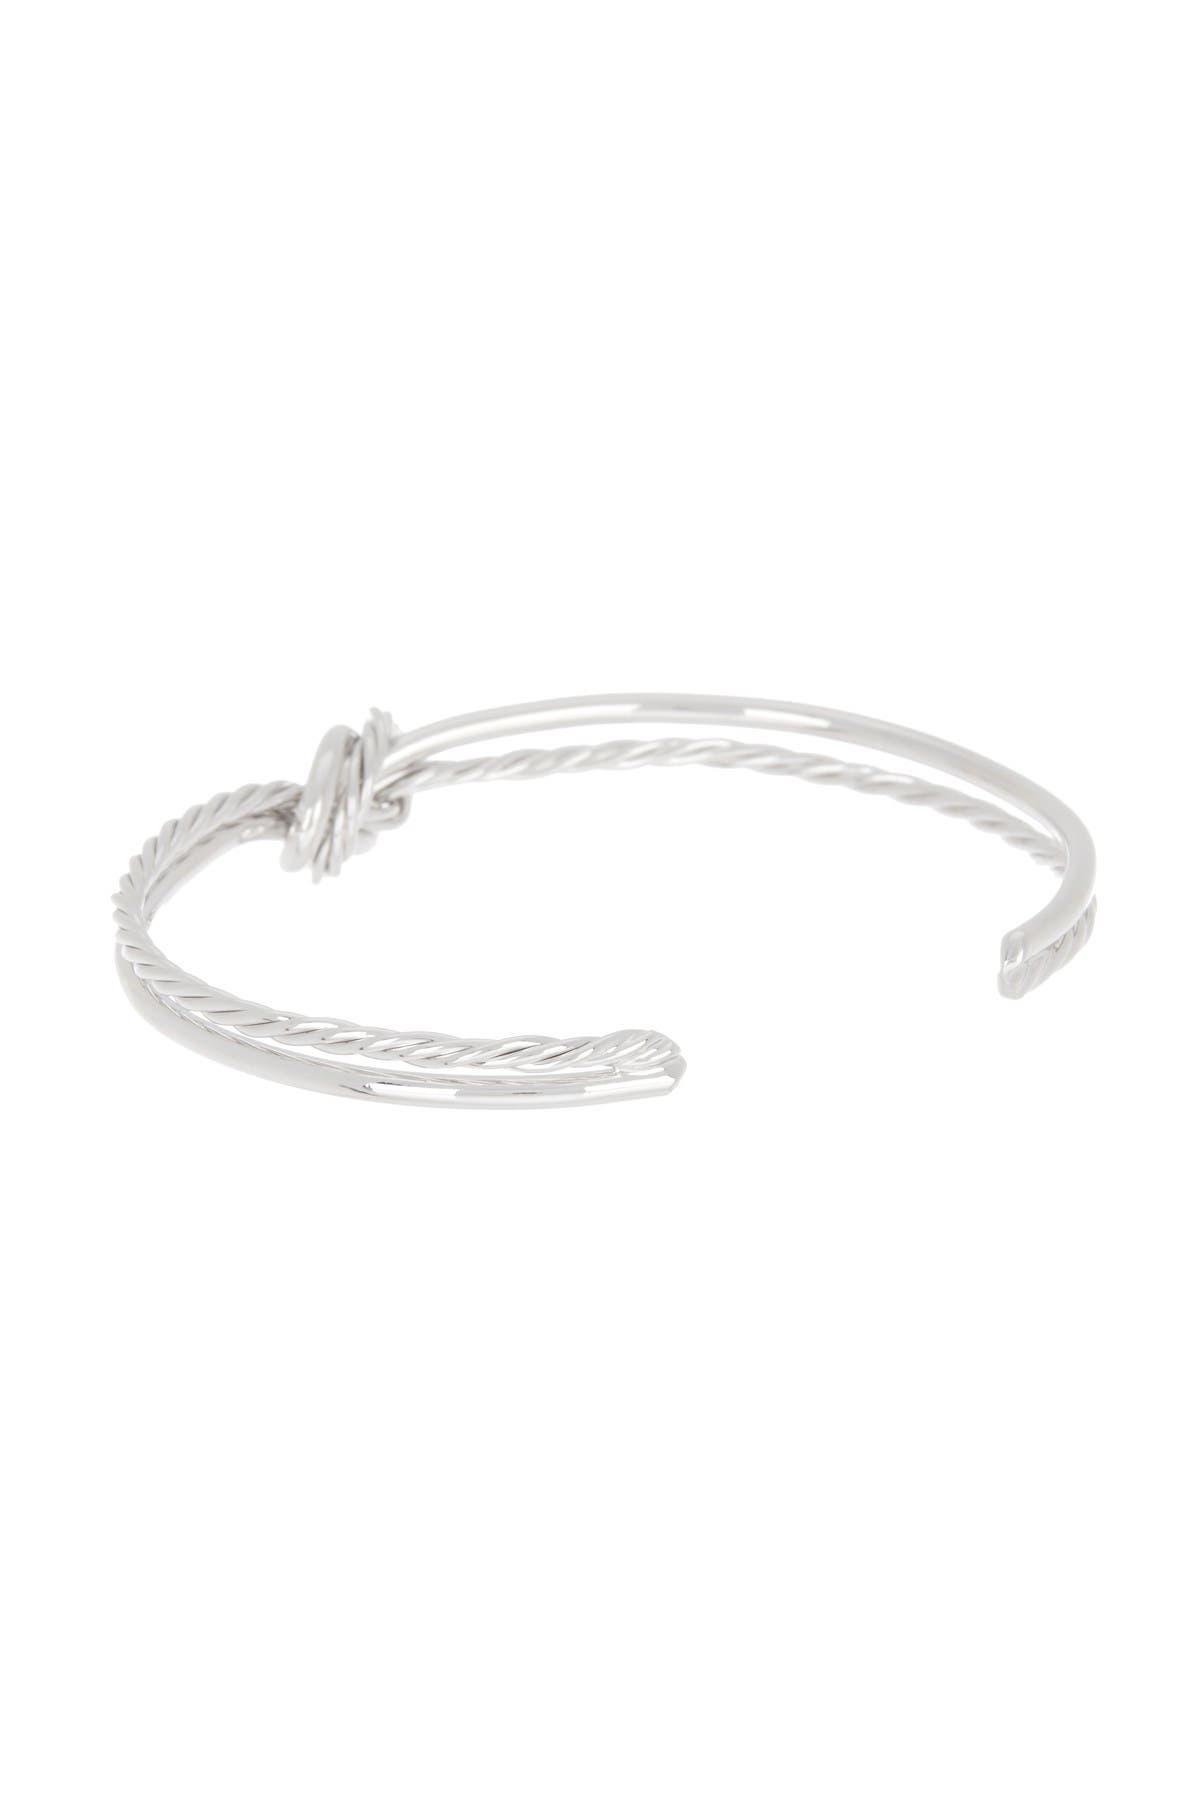 Image of Meshmerise Twisted Cable Multi Row Love Knot Cuff Bangle